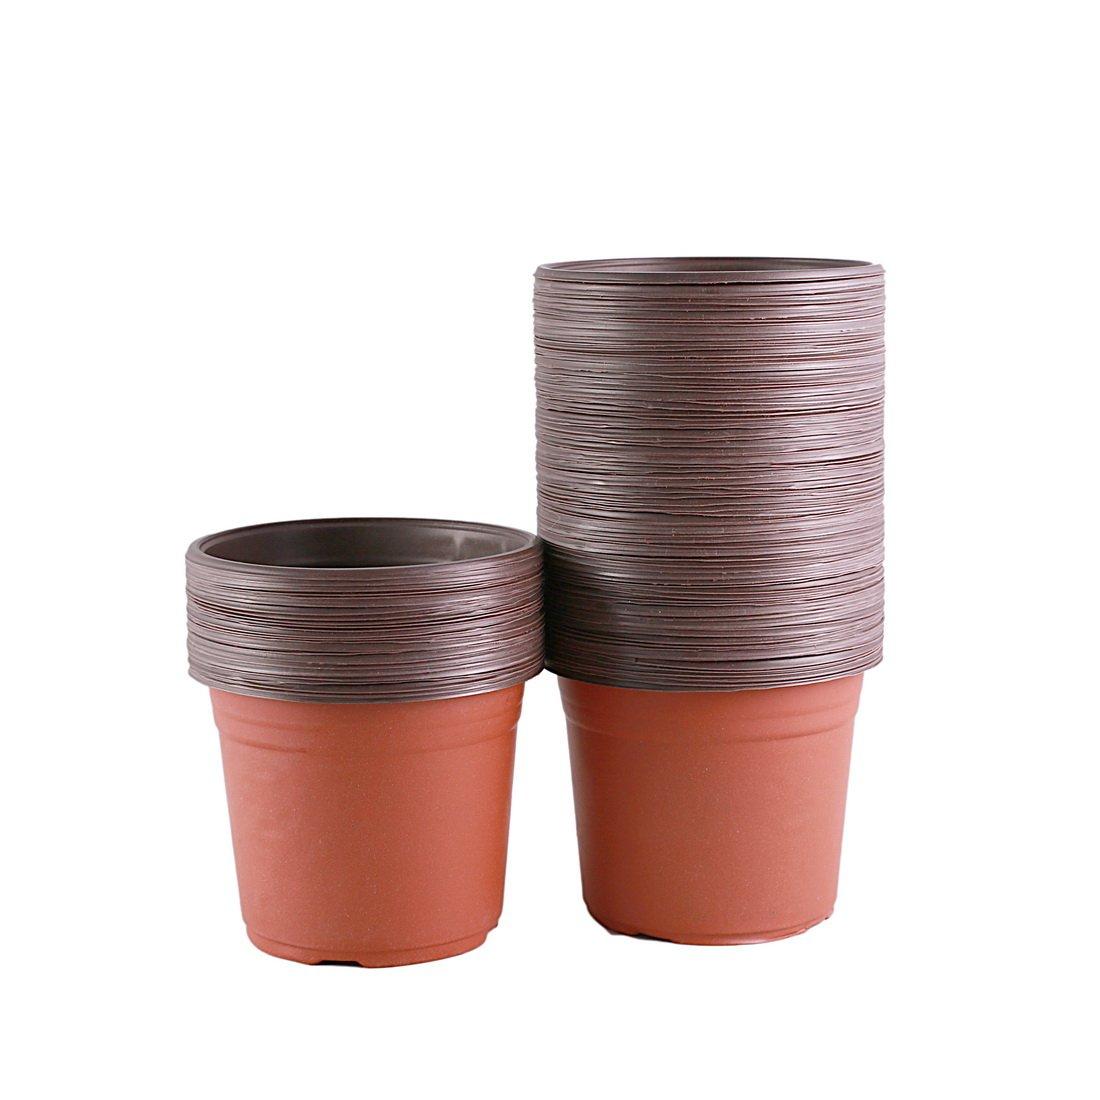 YIKUSH 6 Inch 100 Pack Plastic Nursery Pots for Seeding Flower Planter by YIKUSH